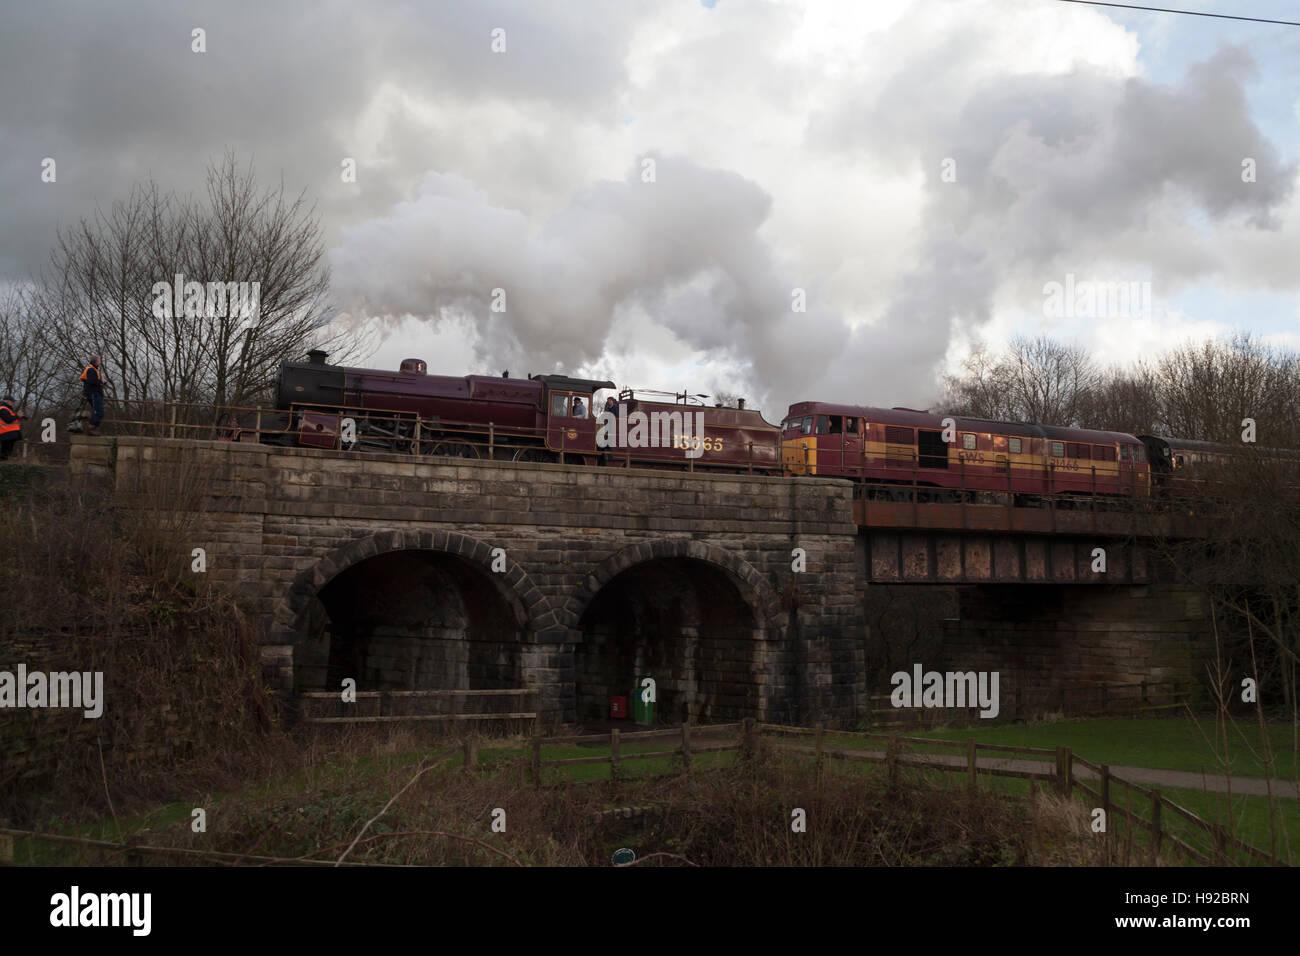 Steam train on East Lancs railway - Stock Image